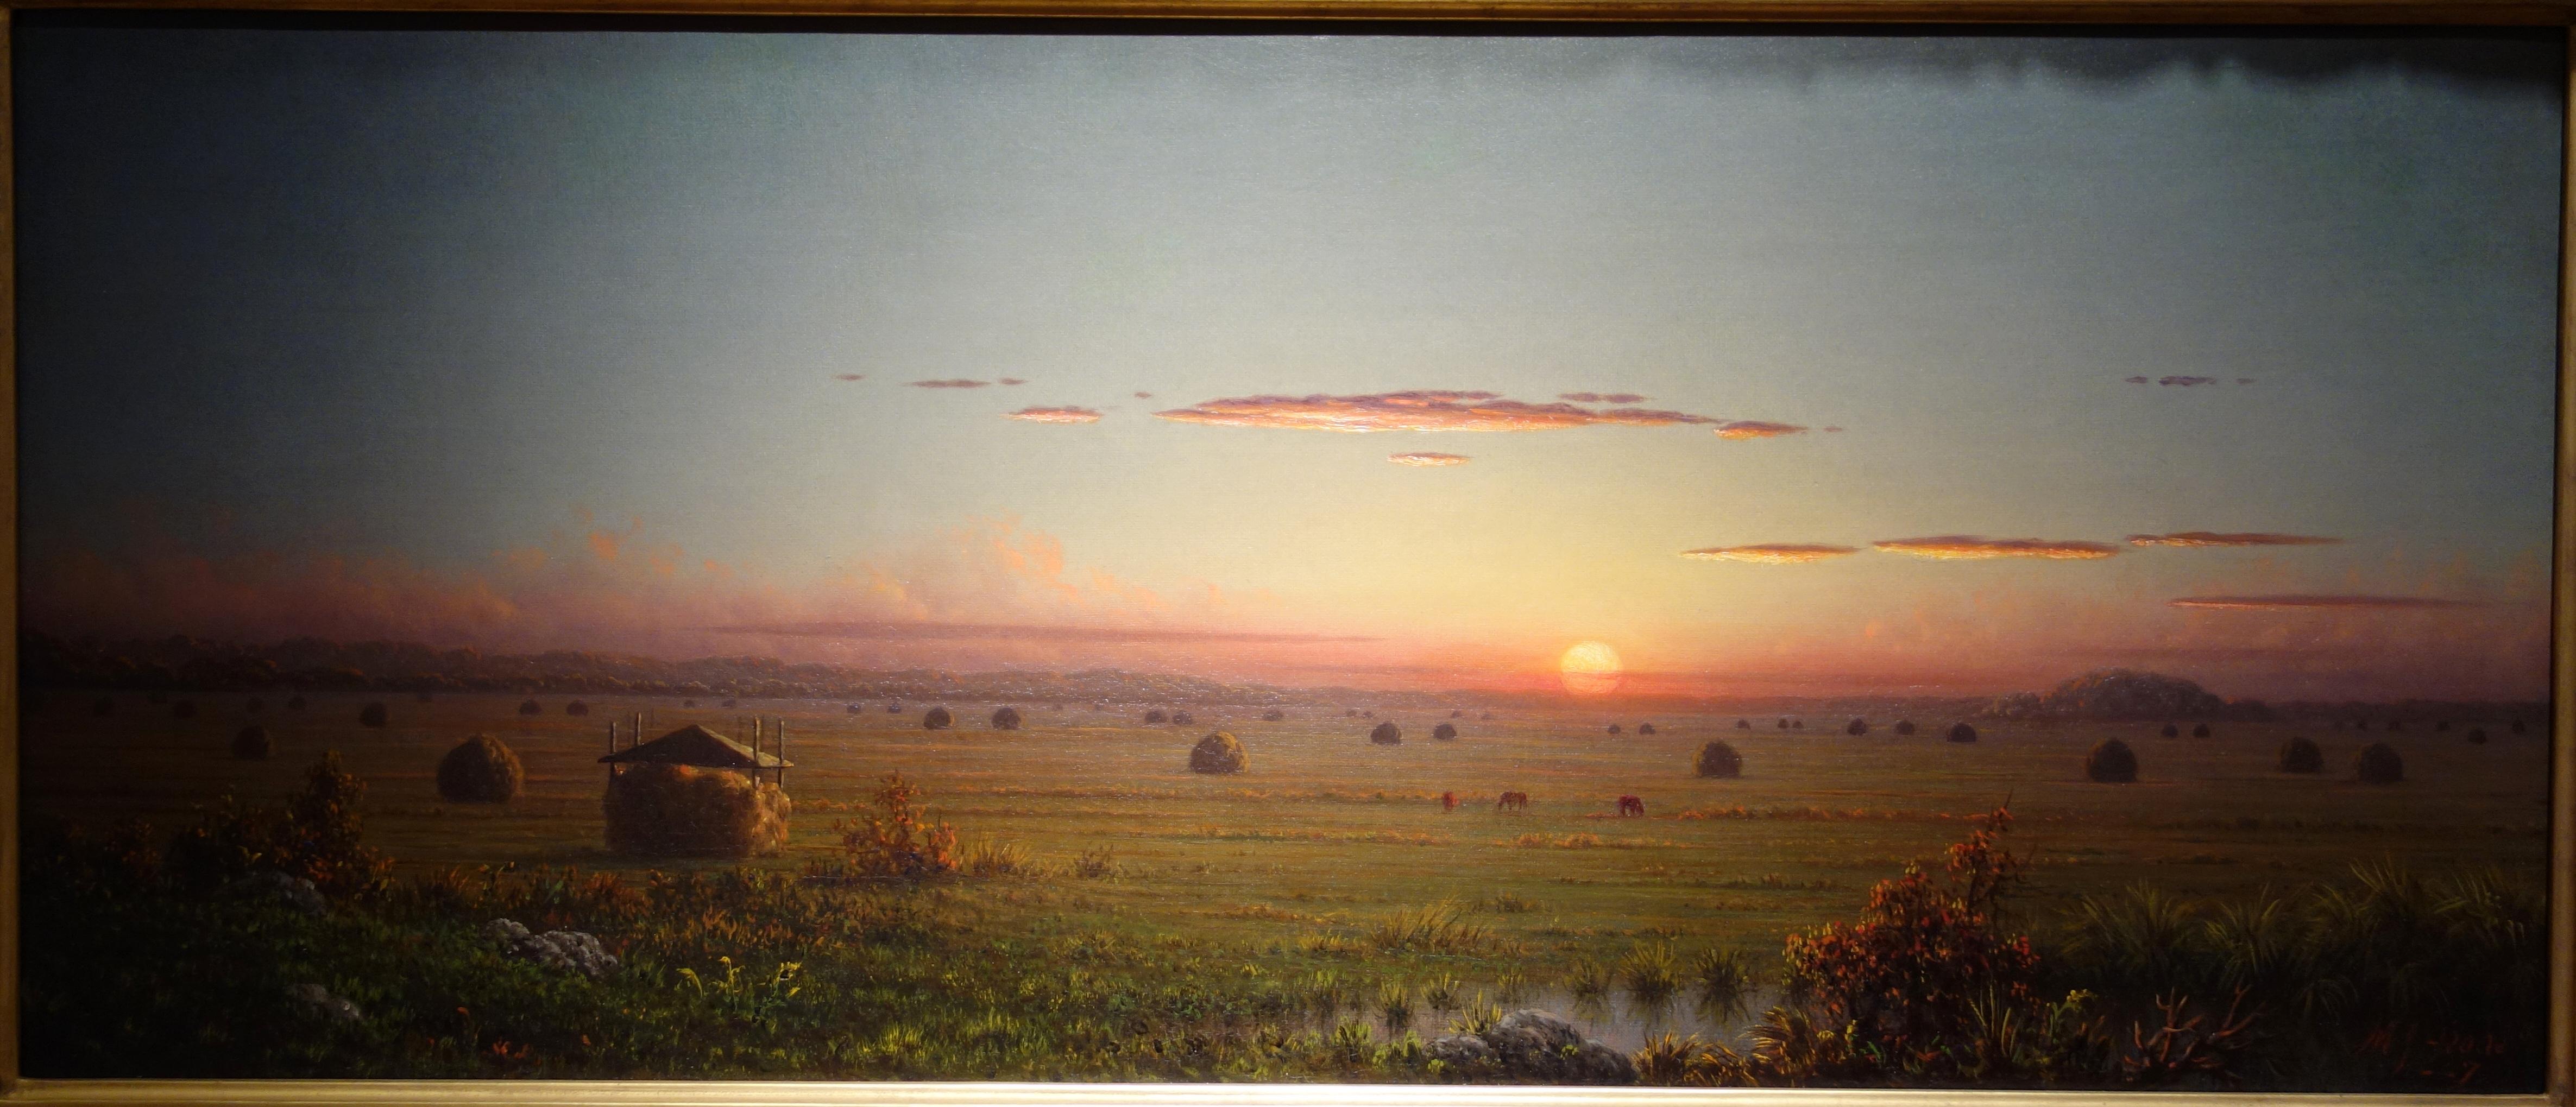 FileIpswich Marshes By Martin Johnson Heade 1867 Oil On